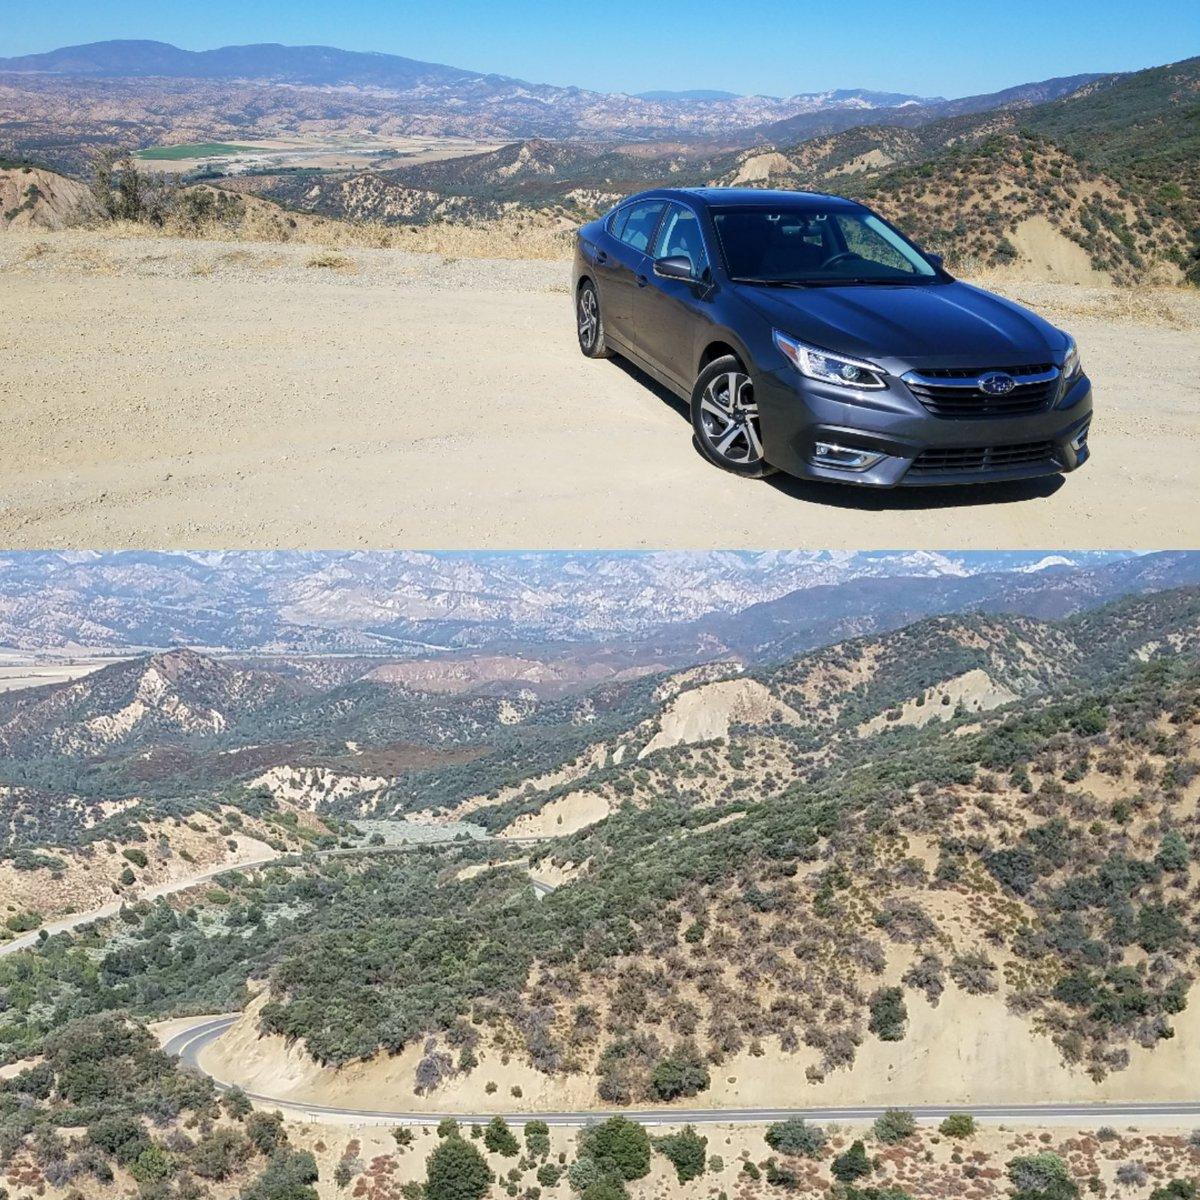 Mountain carving: Cal-33 Los Padres Nat Park in AWD 260hp @Subaru Legacy XT. CA @DetroitNews